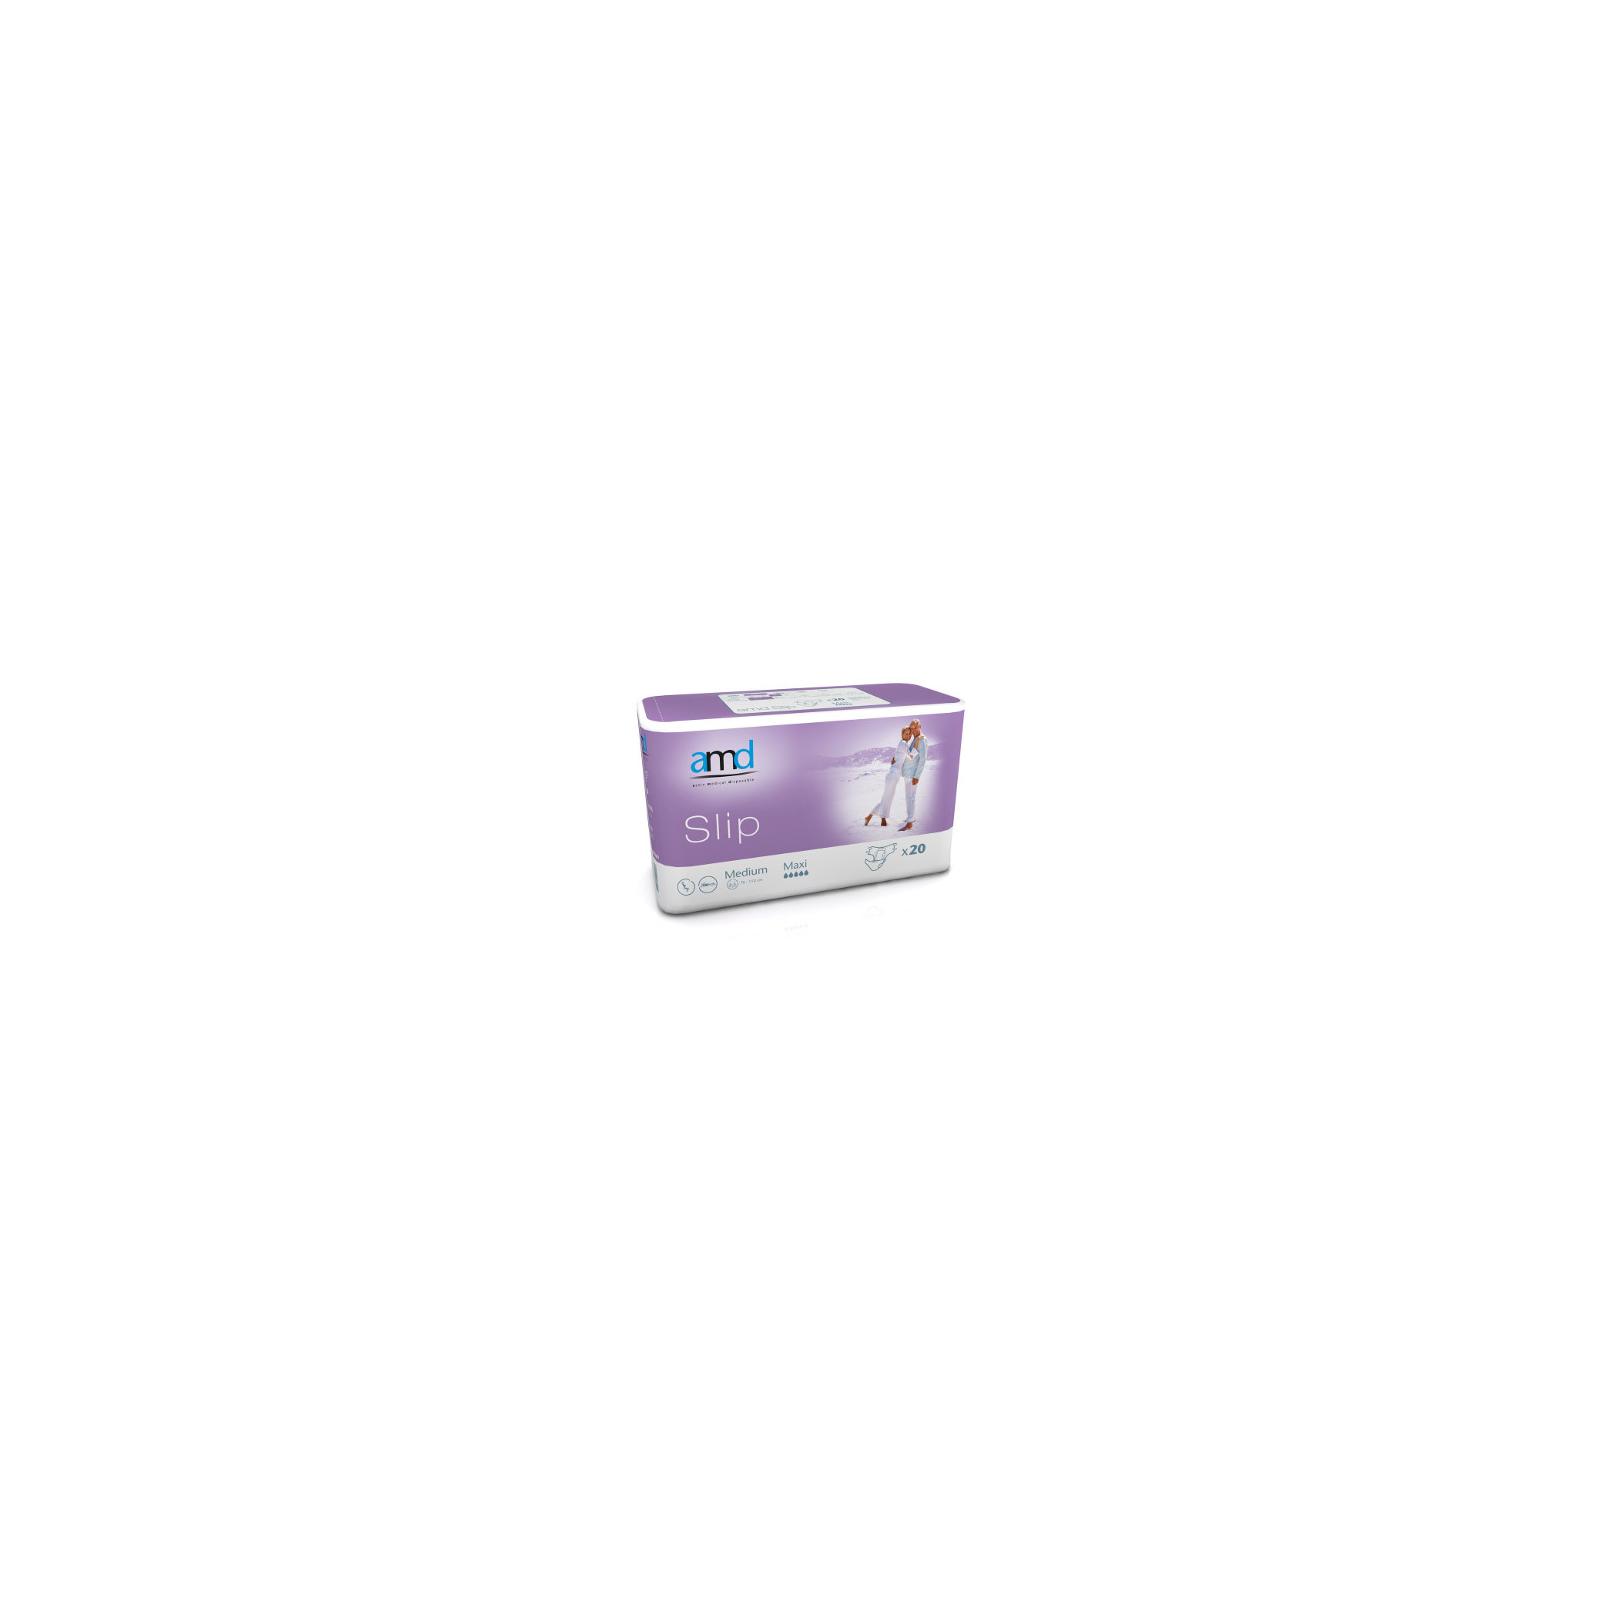 AMD Slip Maxi Medium| SenUp.com